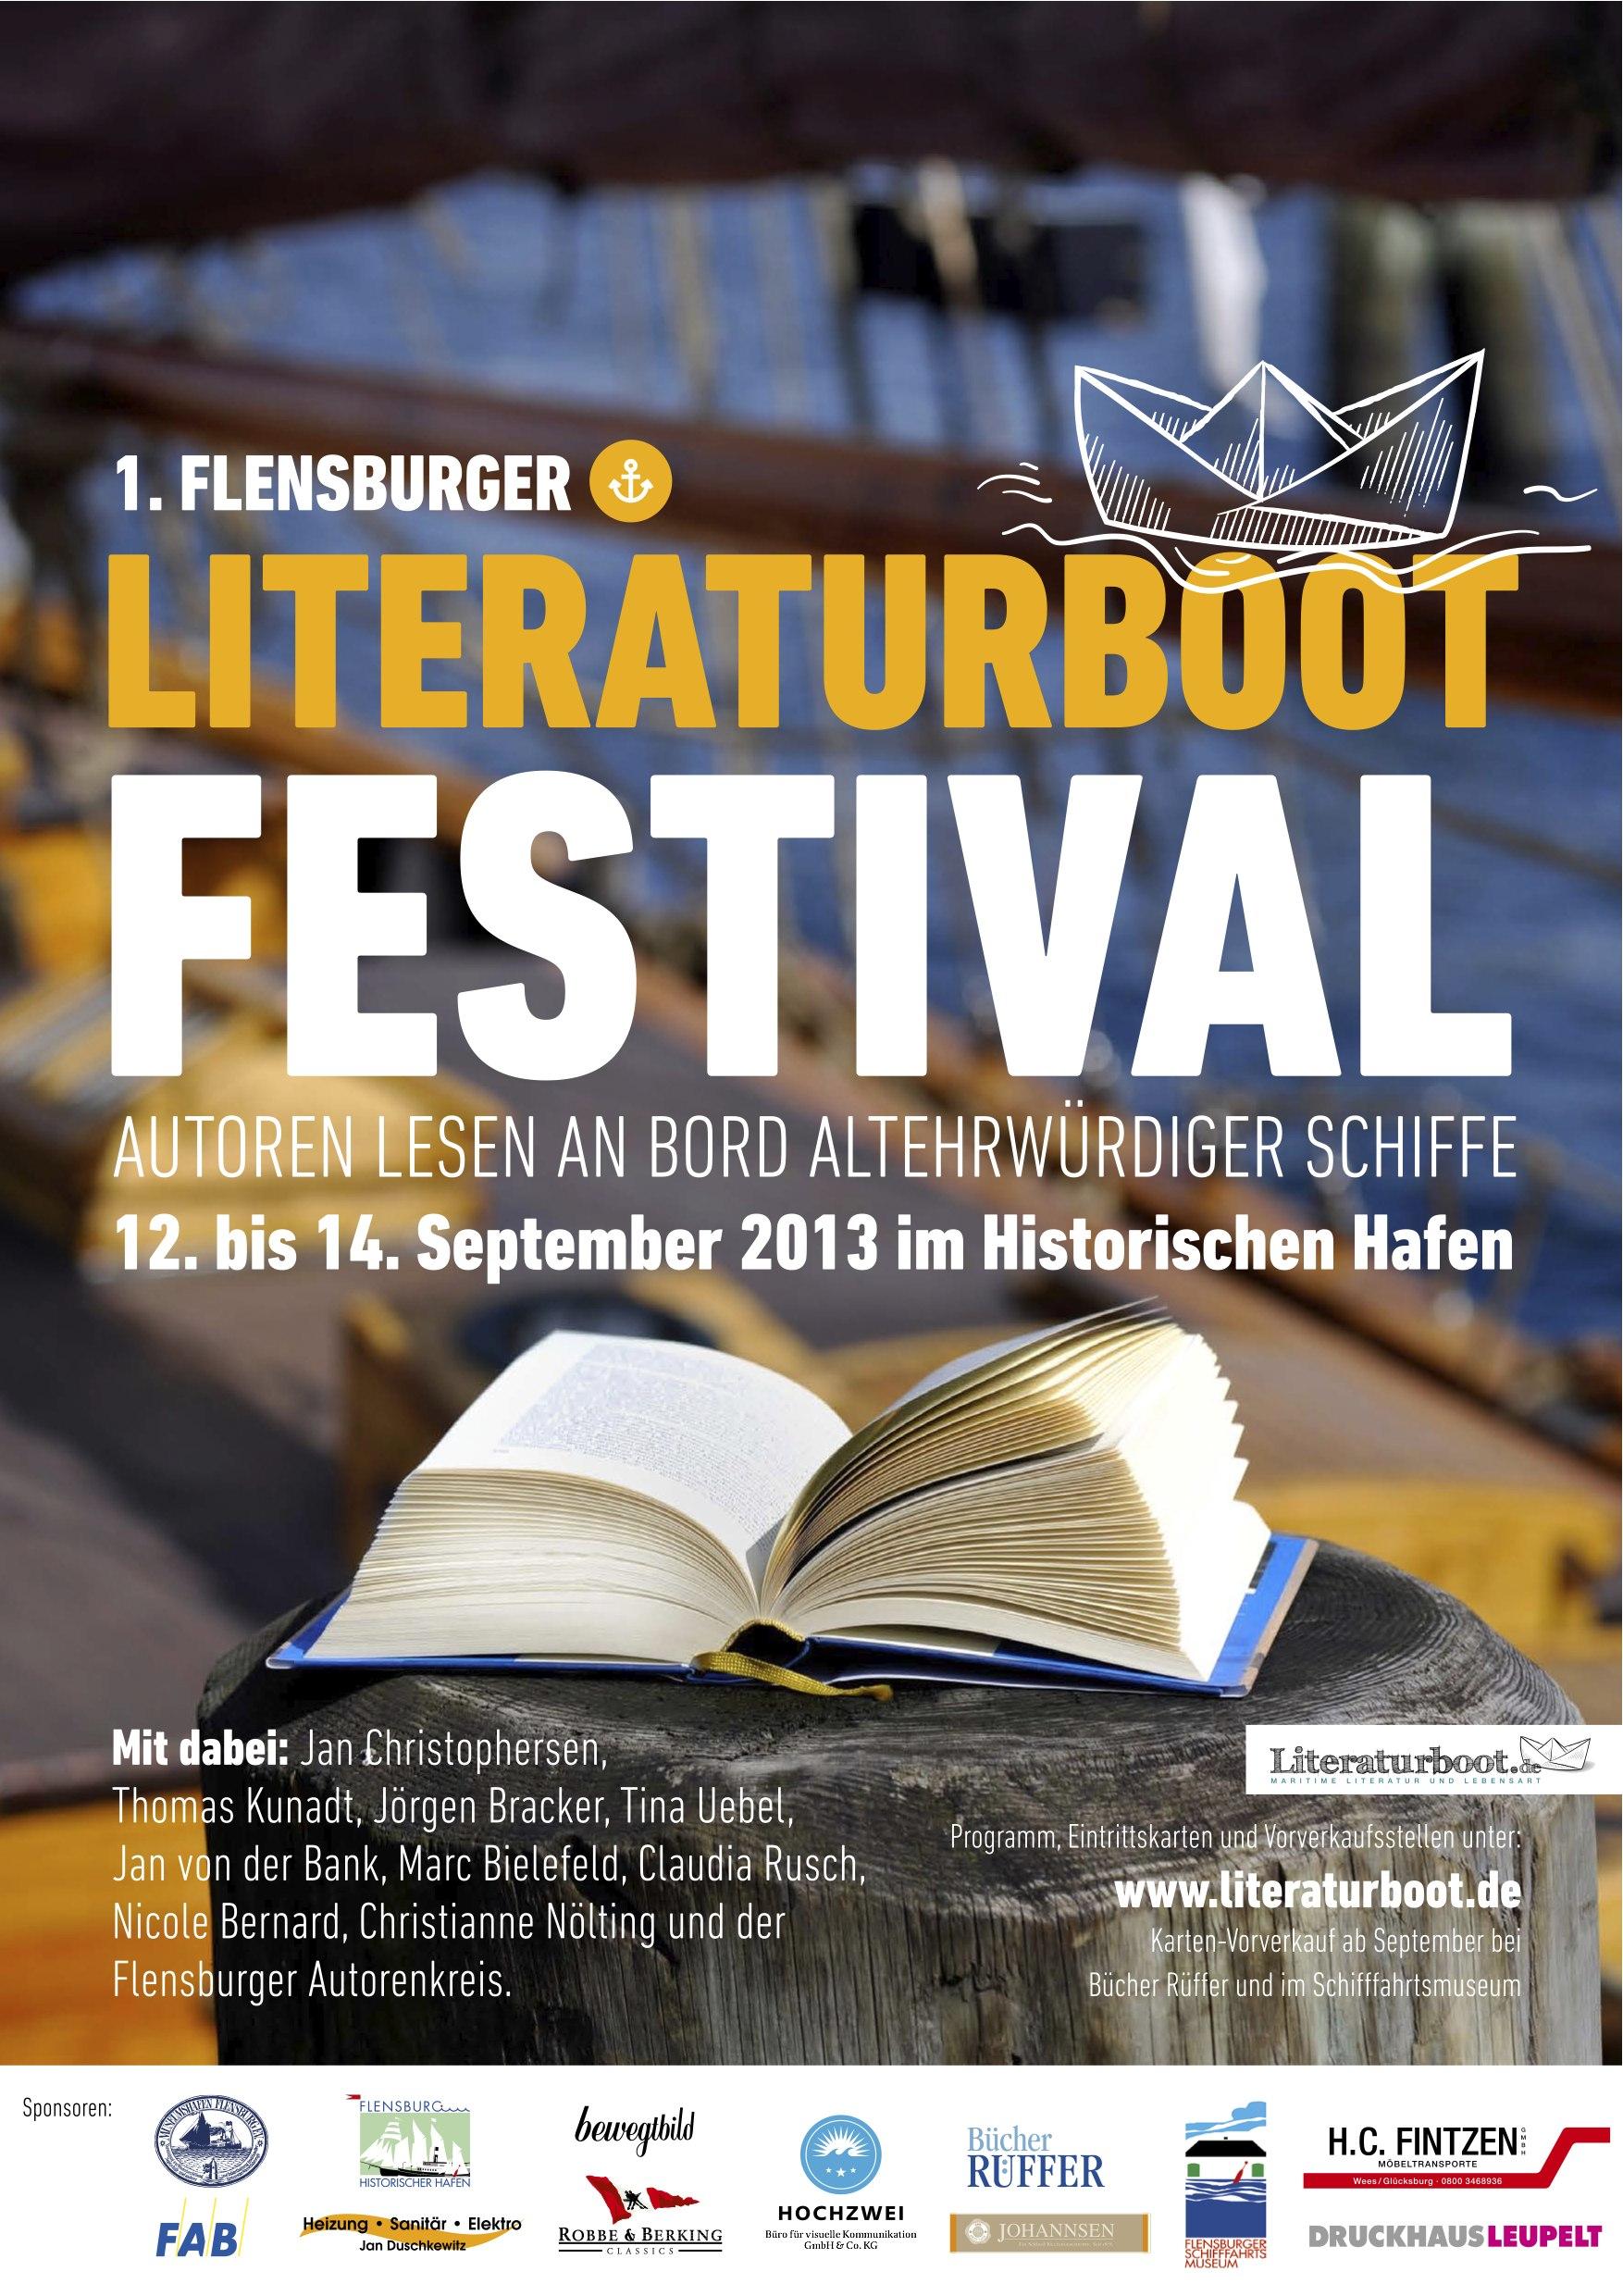 LIBO_1300_PP_001 Plakat Literaturfestival 2013_DIN A3_2